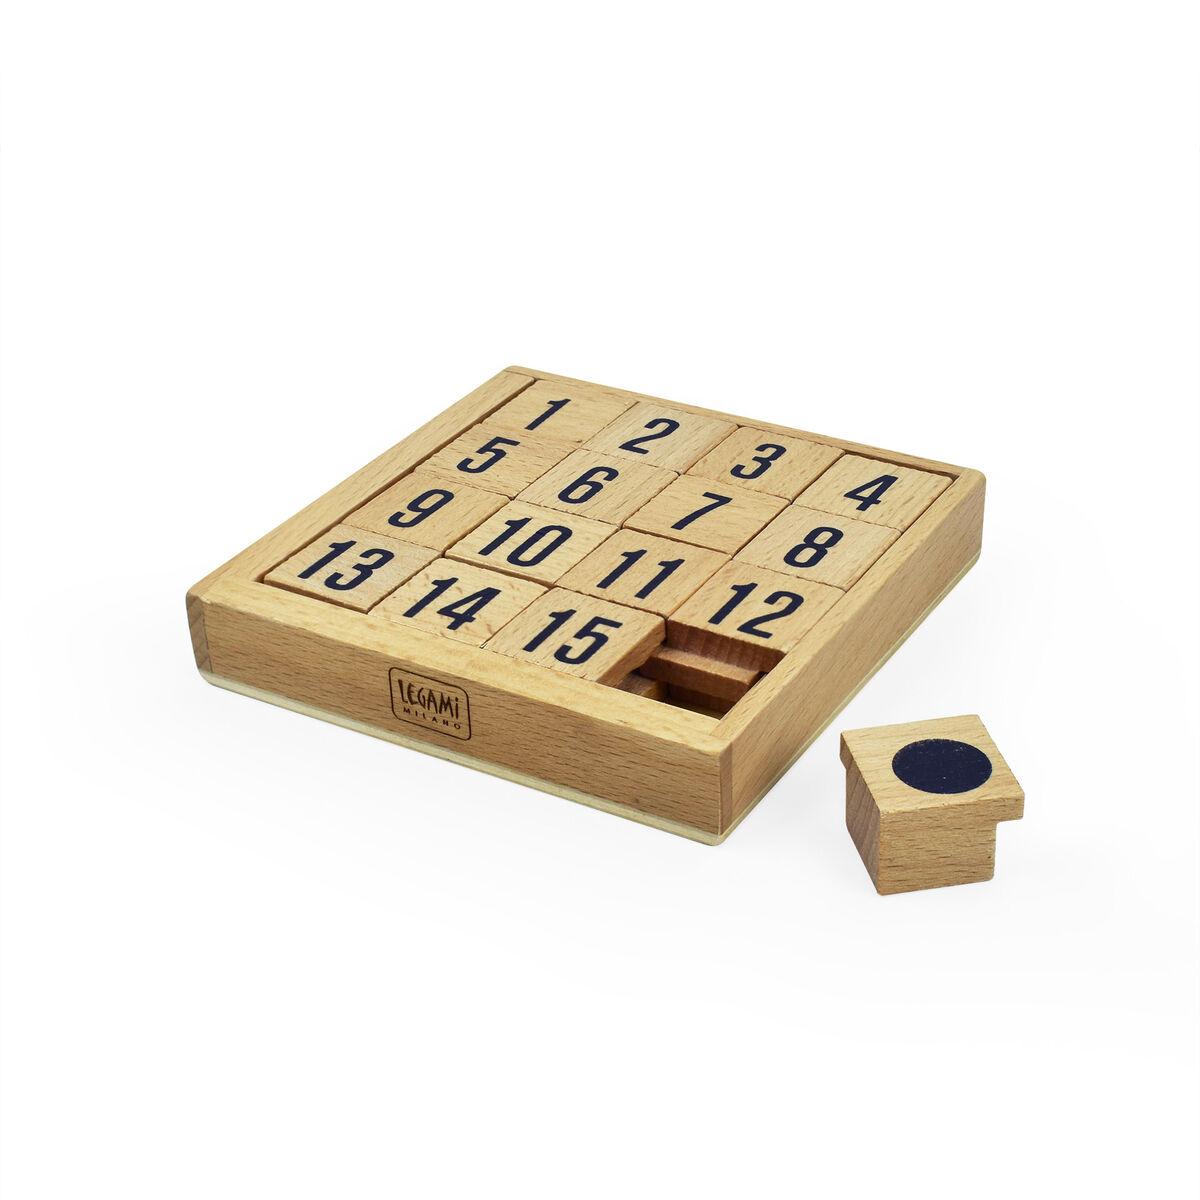 15 Puzzle - Rompicapo Numerico, , zoo